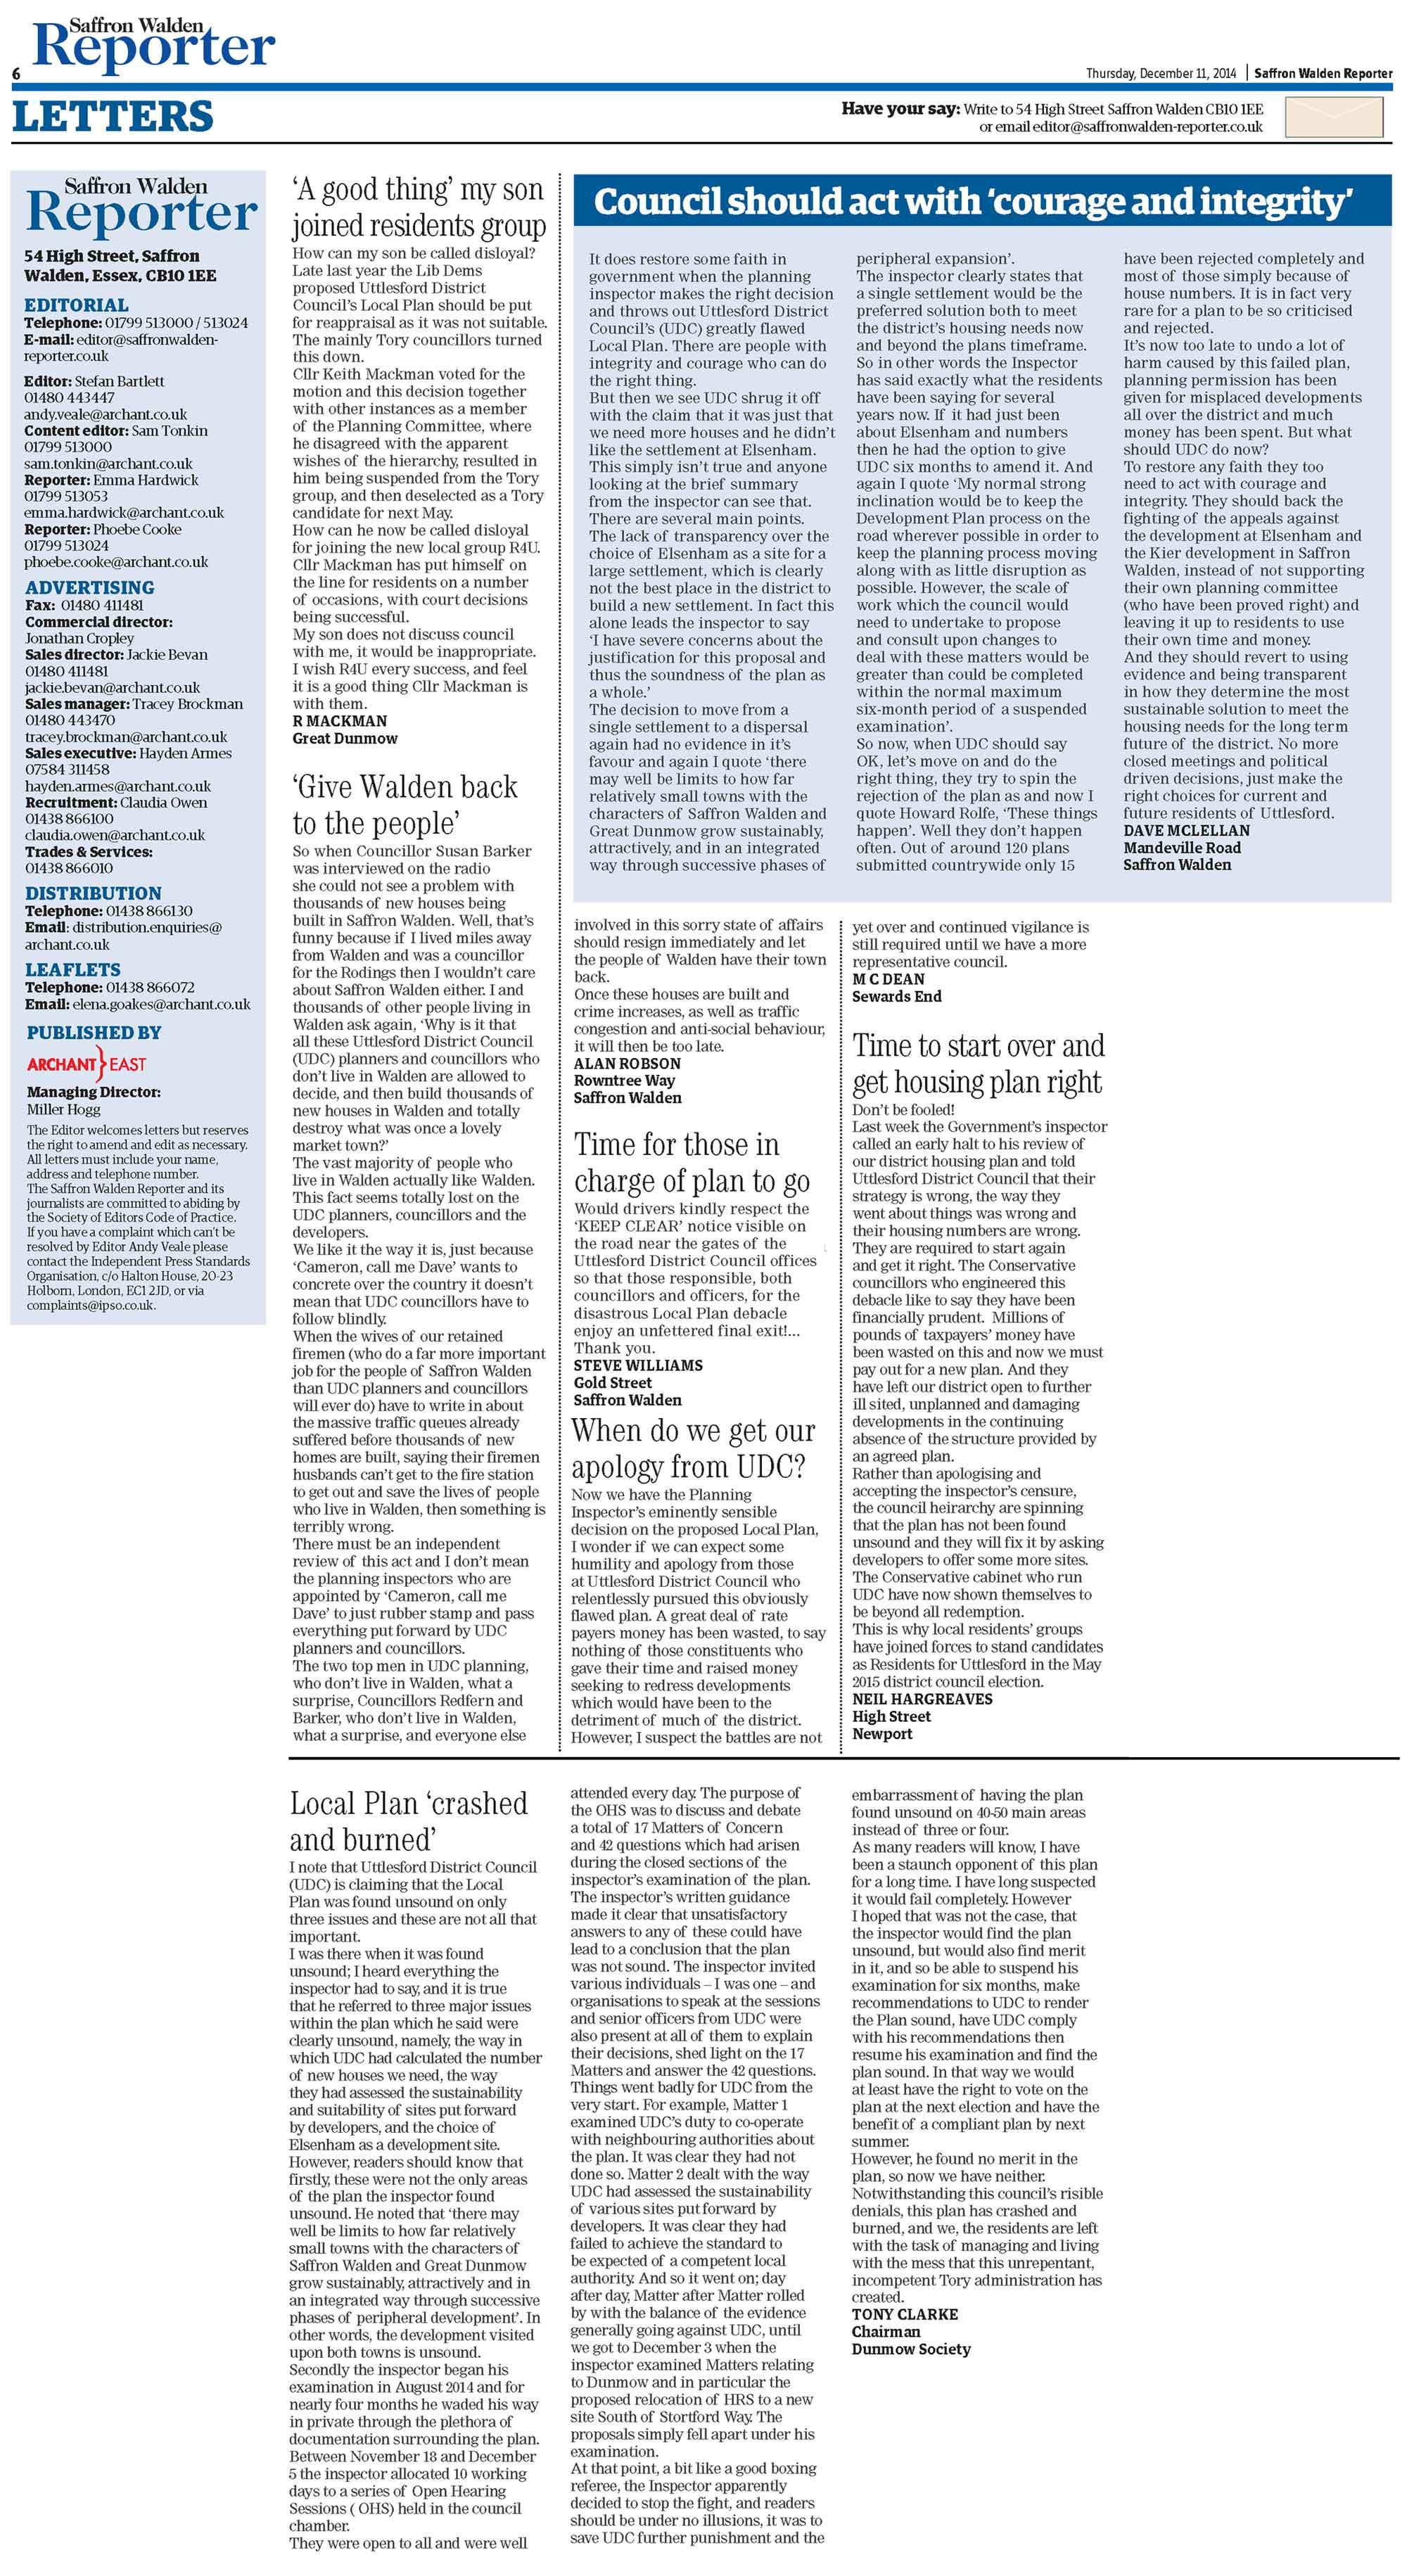 Uttlesford Local Plan Refusal: Saffron Walden Reporter letters (11-Dec-2014)